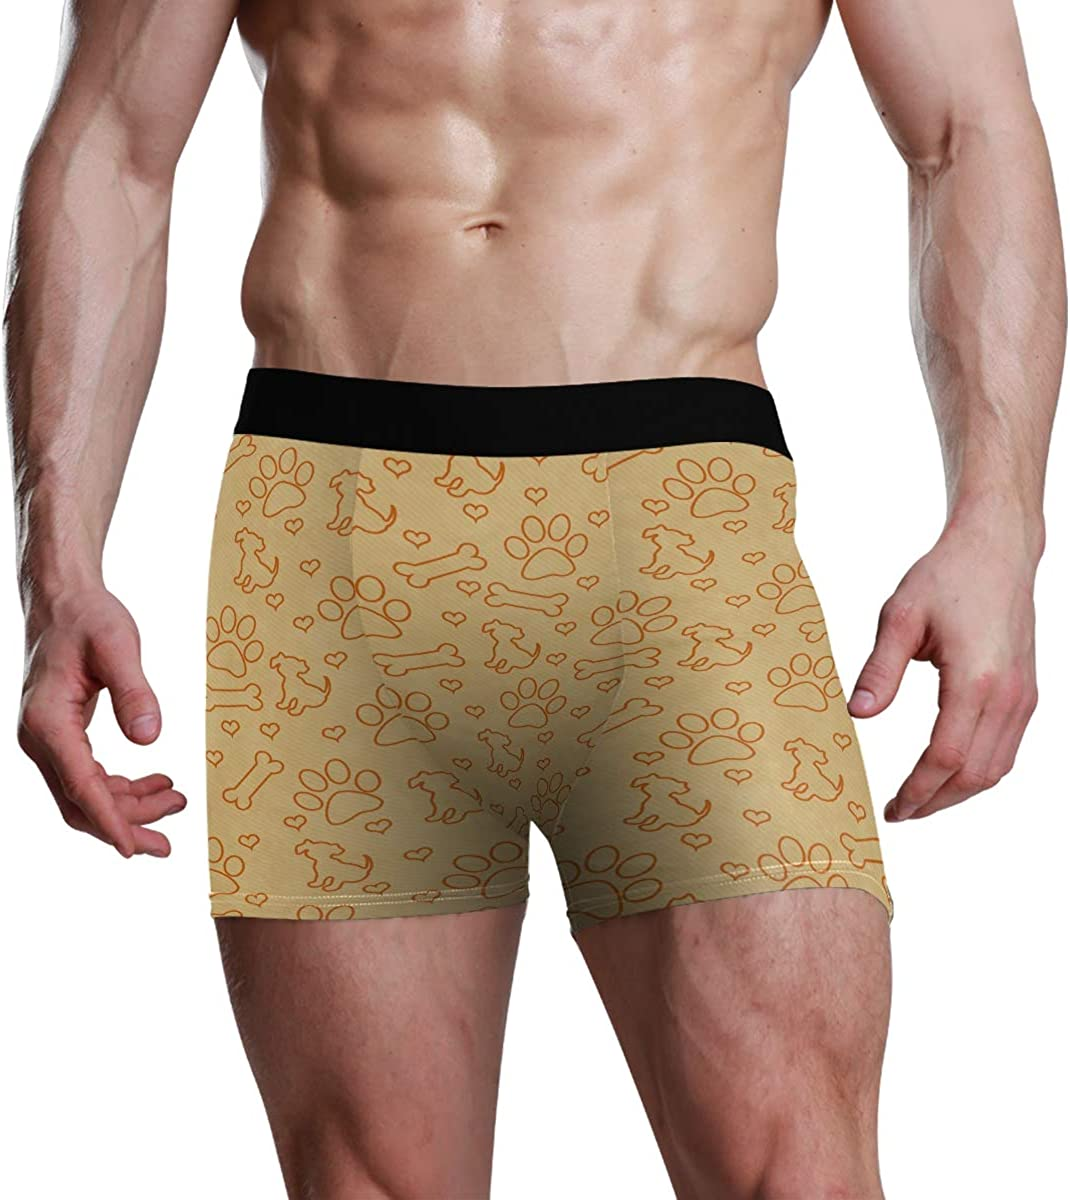 Mens Underwear Boxers Orange Dog Paw Prints Puppy ComfortSoft Boxer Briefs Breathable Bikini